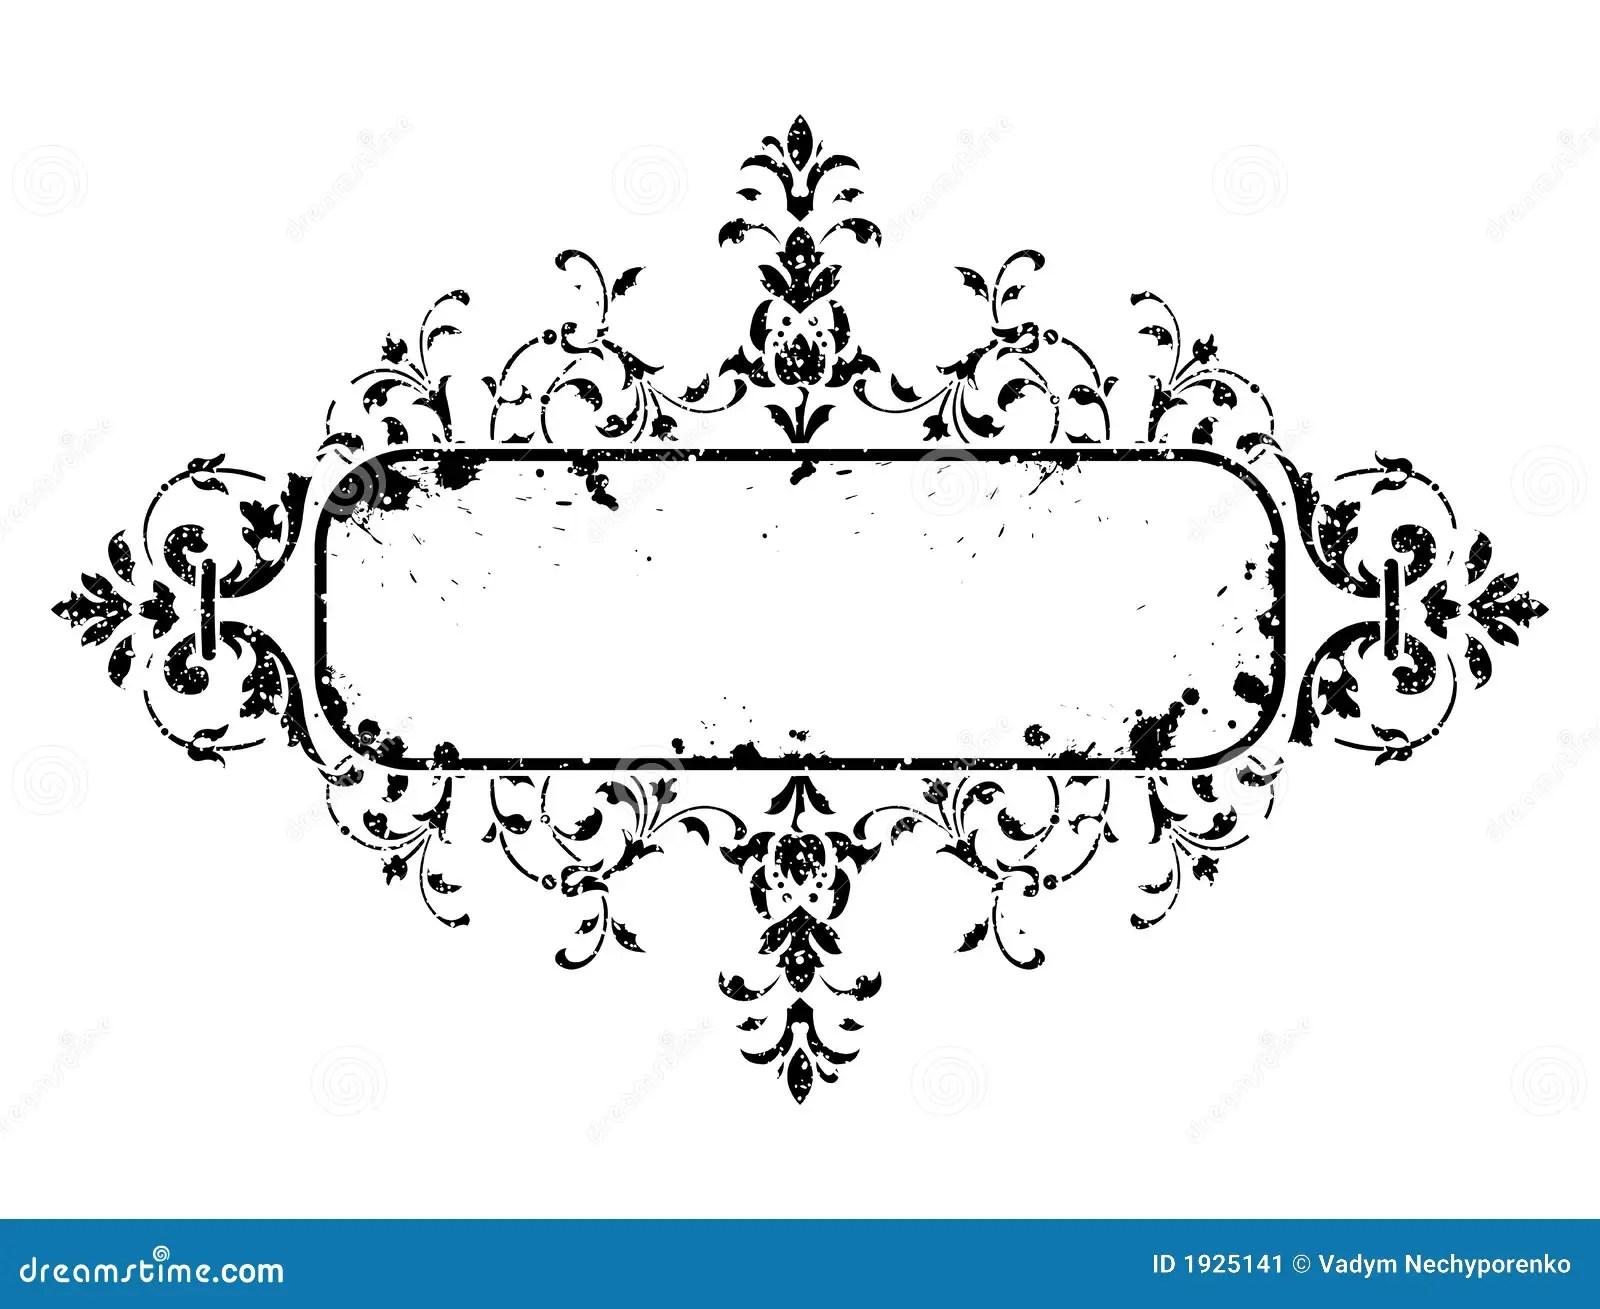 Old Grunge Frame With Floral Decoration Vector